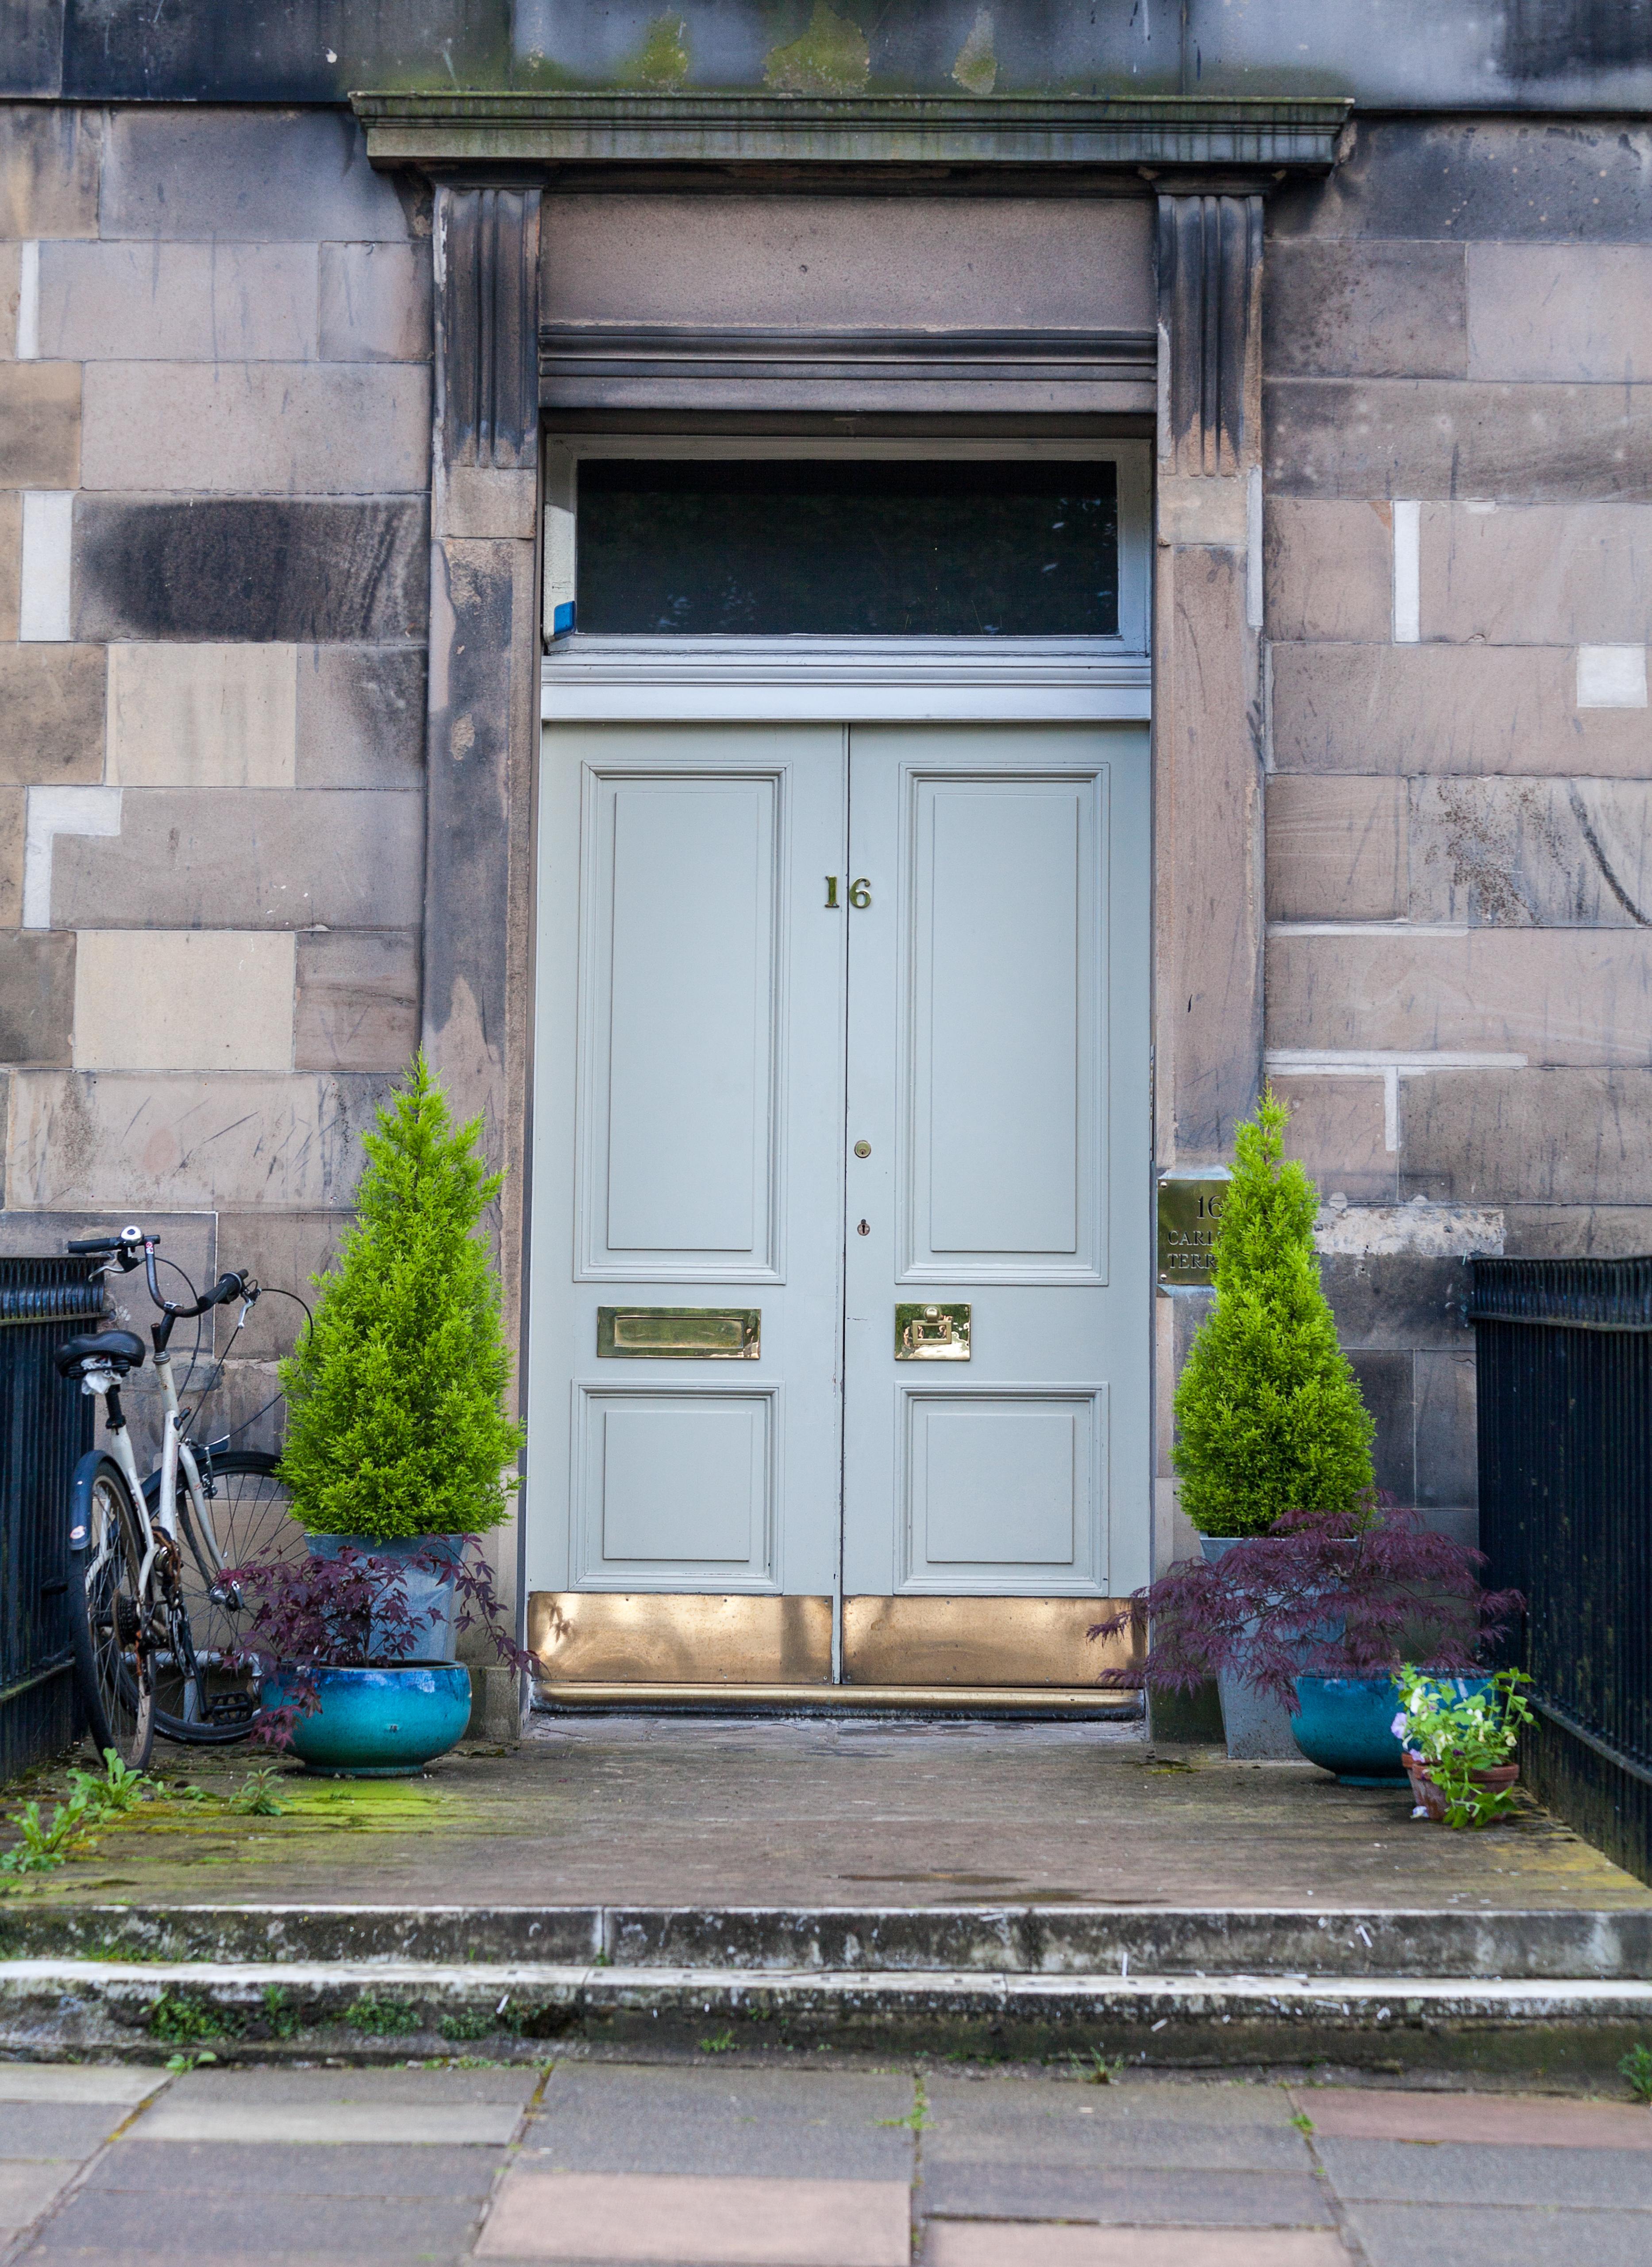 FileDoor of 16 Carlton Terrace Edinburgh Scotland GB IMG 3626 & File:Door of 16 Carlton Terrace Edinburgh Scotland GB IMG 3626 ...